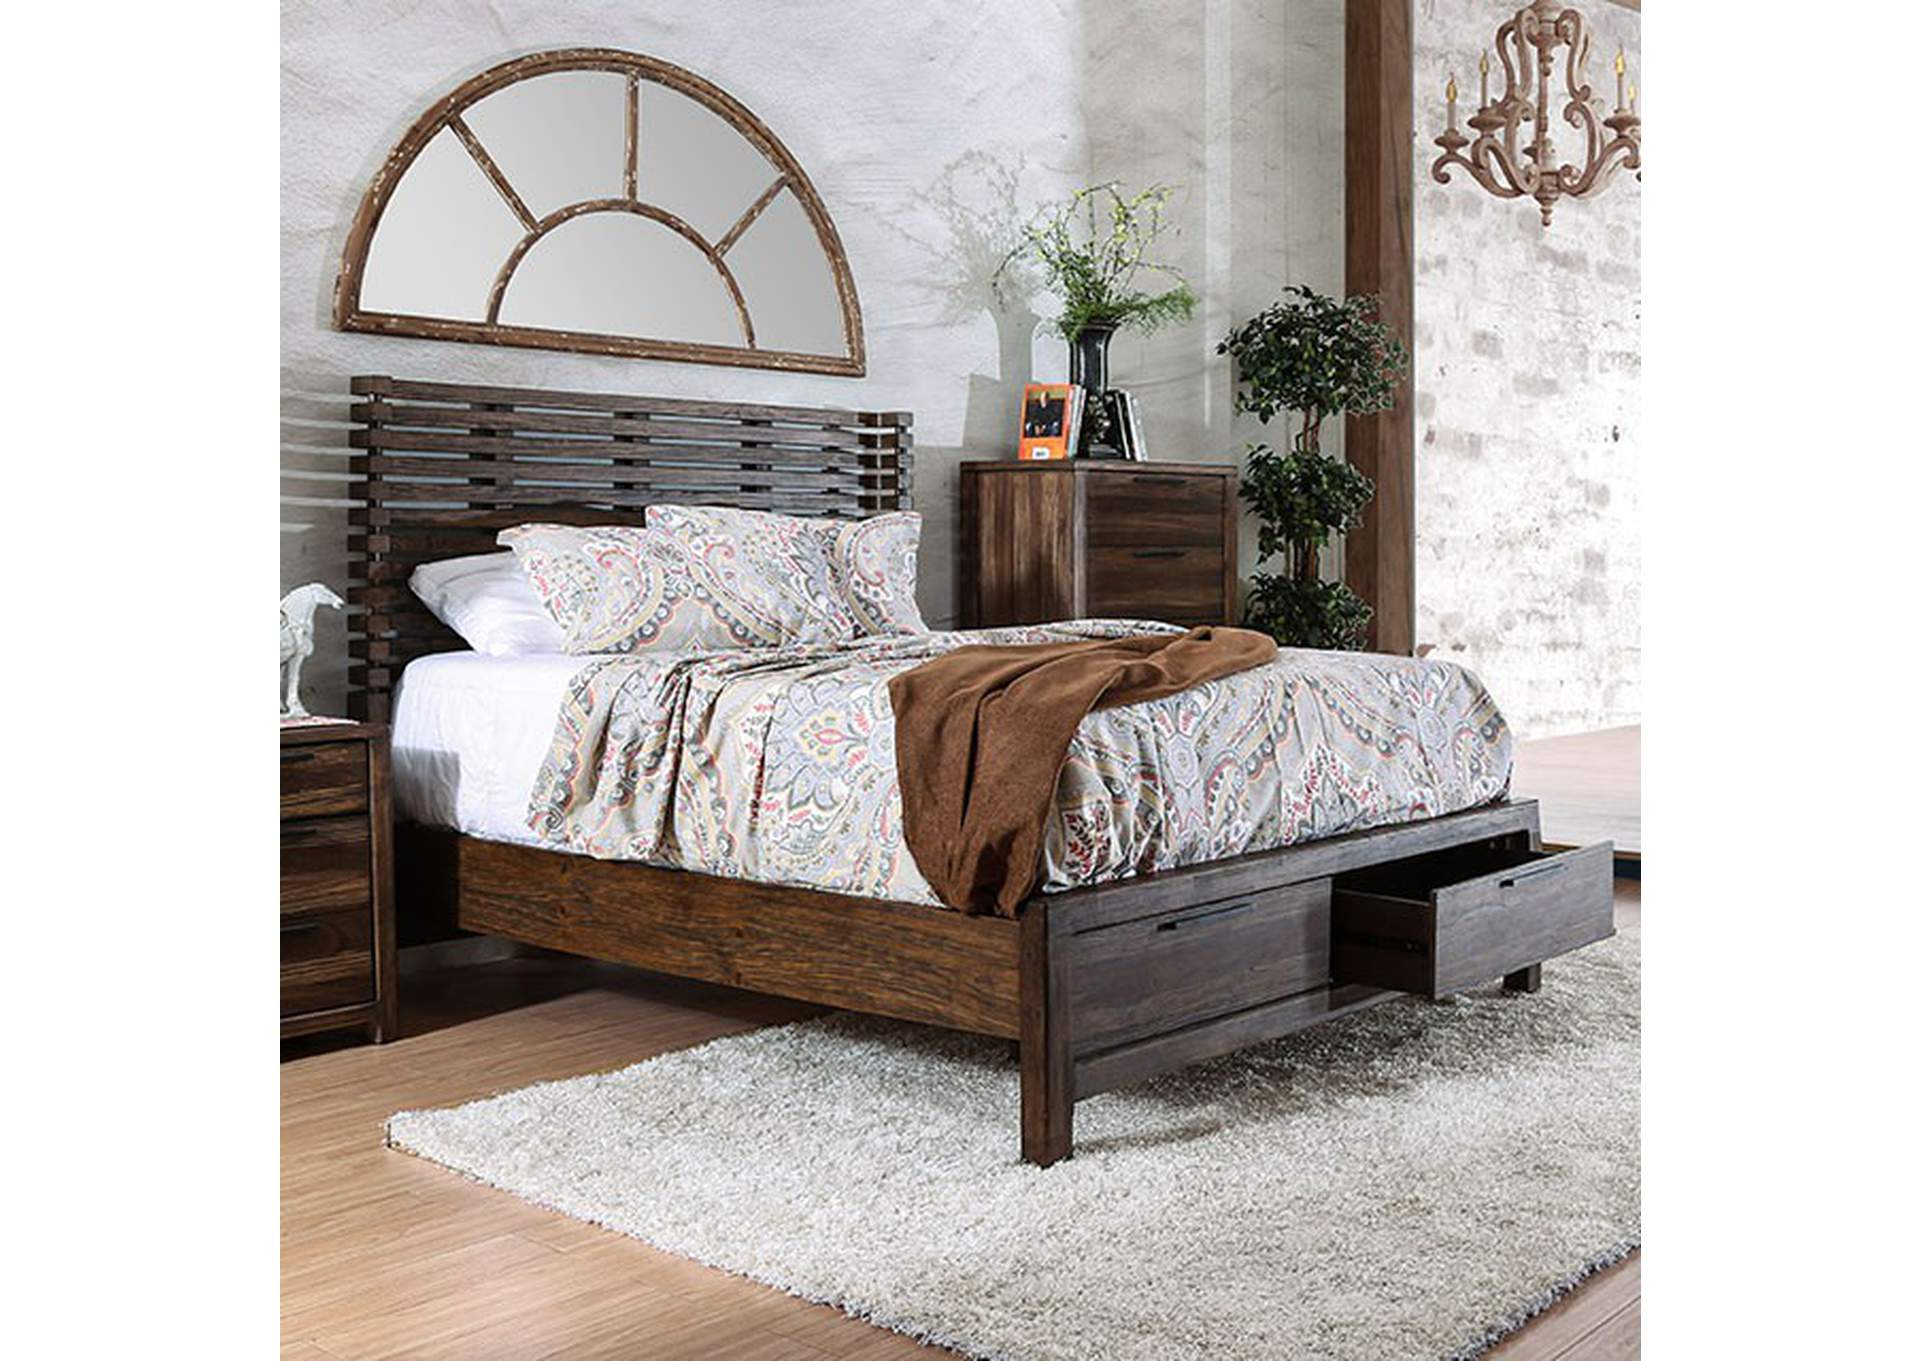 Hankinson Rustic Natural California King Bed Best Buy Furniture And Mattress